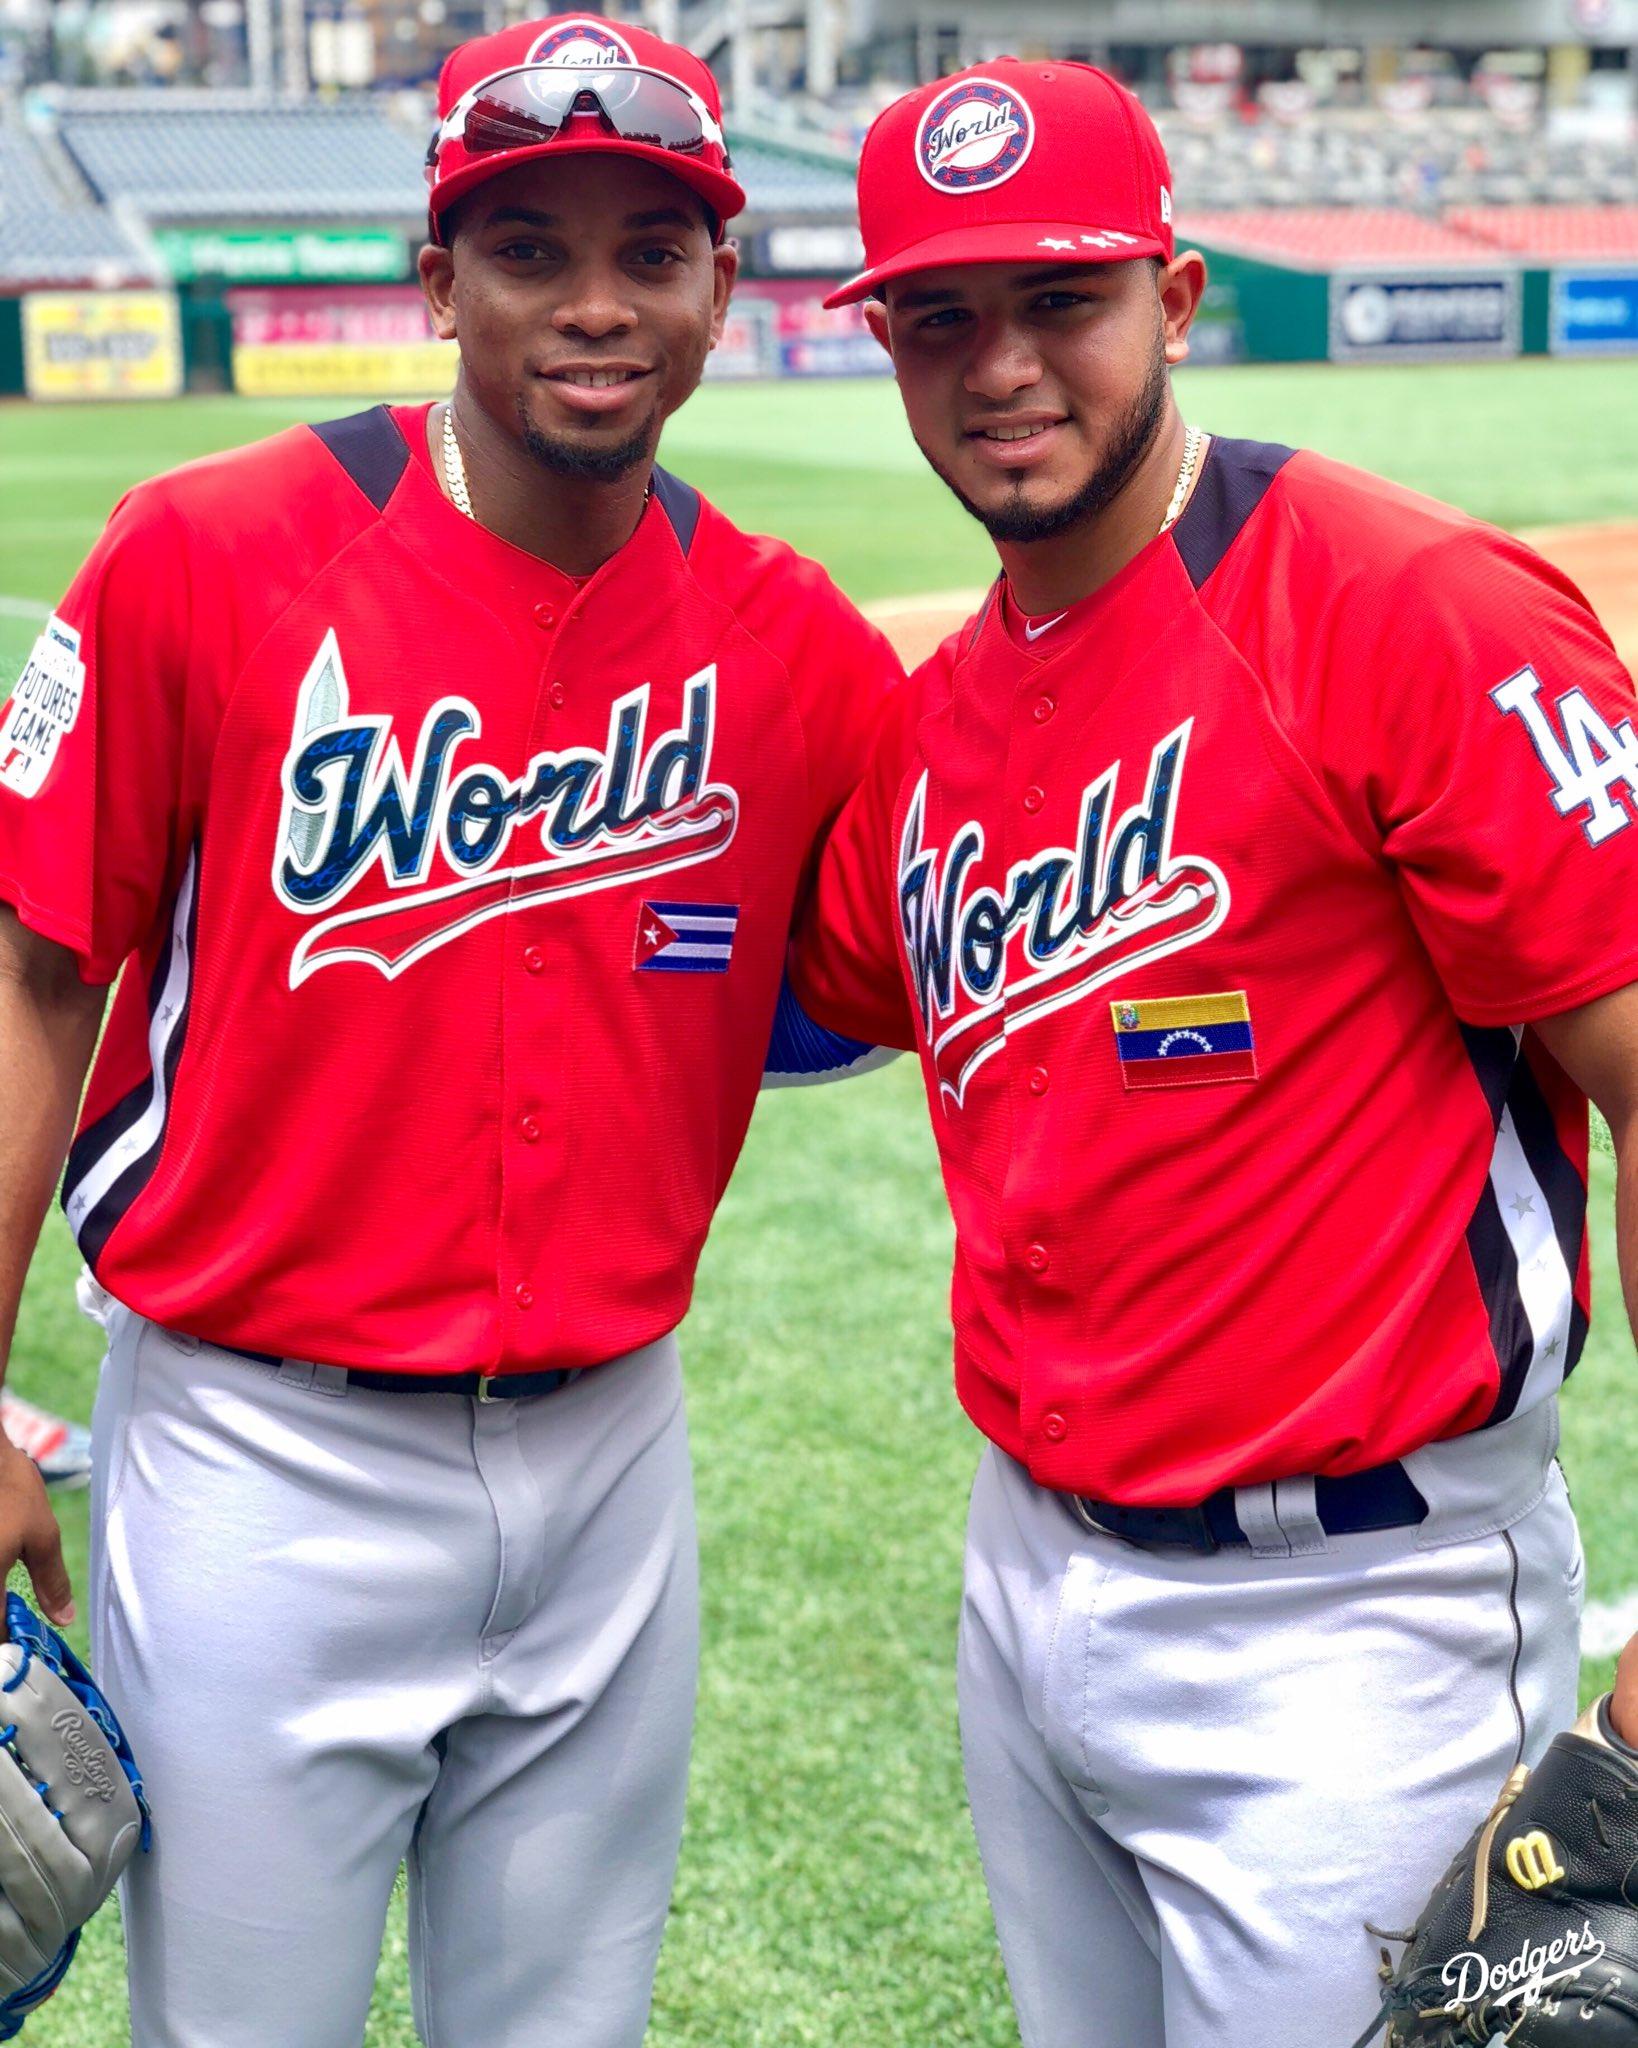 Future's bright! Yusniel Diaz and Keibert Ruiz are ready for the #FuturesGame. https://t.co/0zwhcv6owT